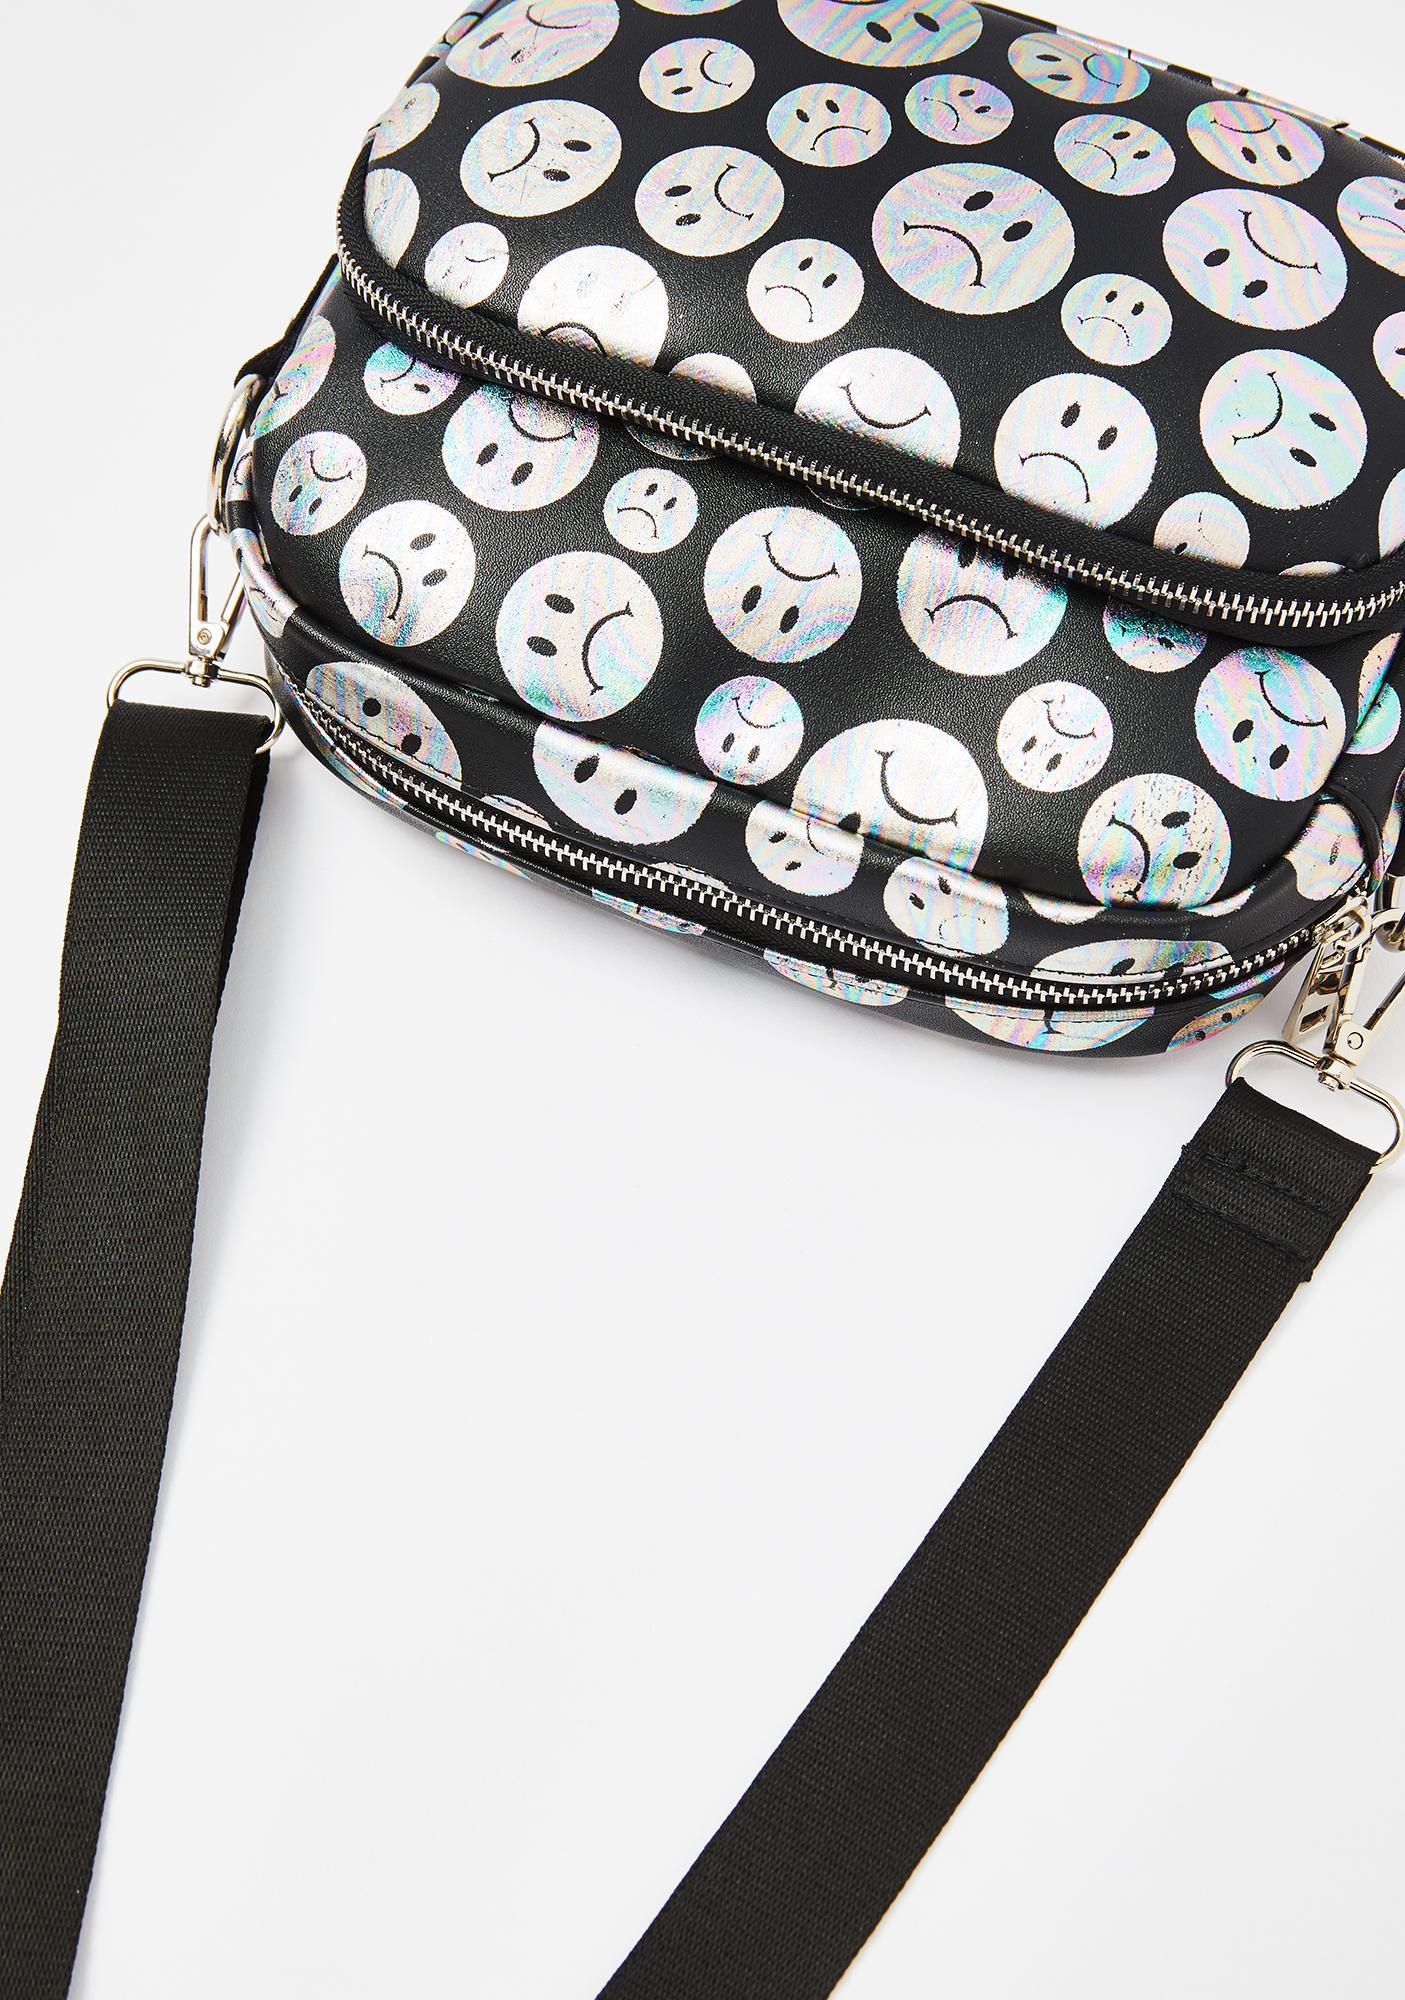 HOROSCOPEZ Sad Girls Club Crossbody Bag